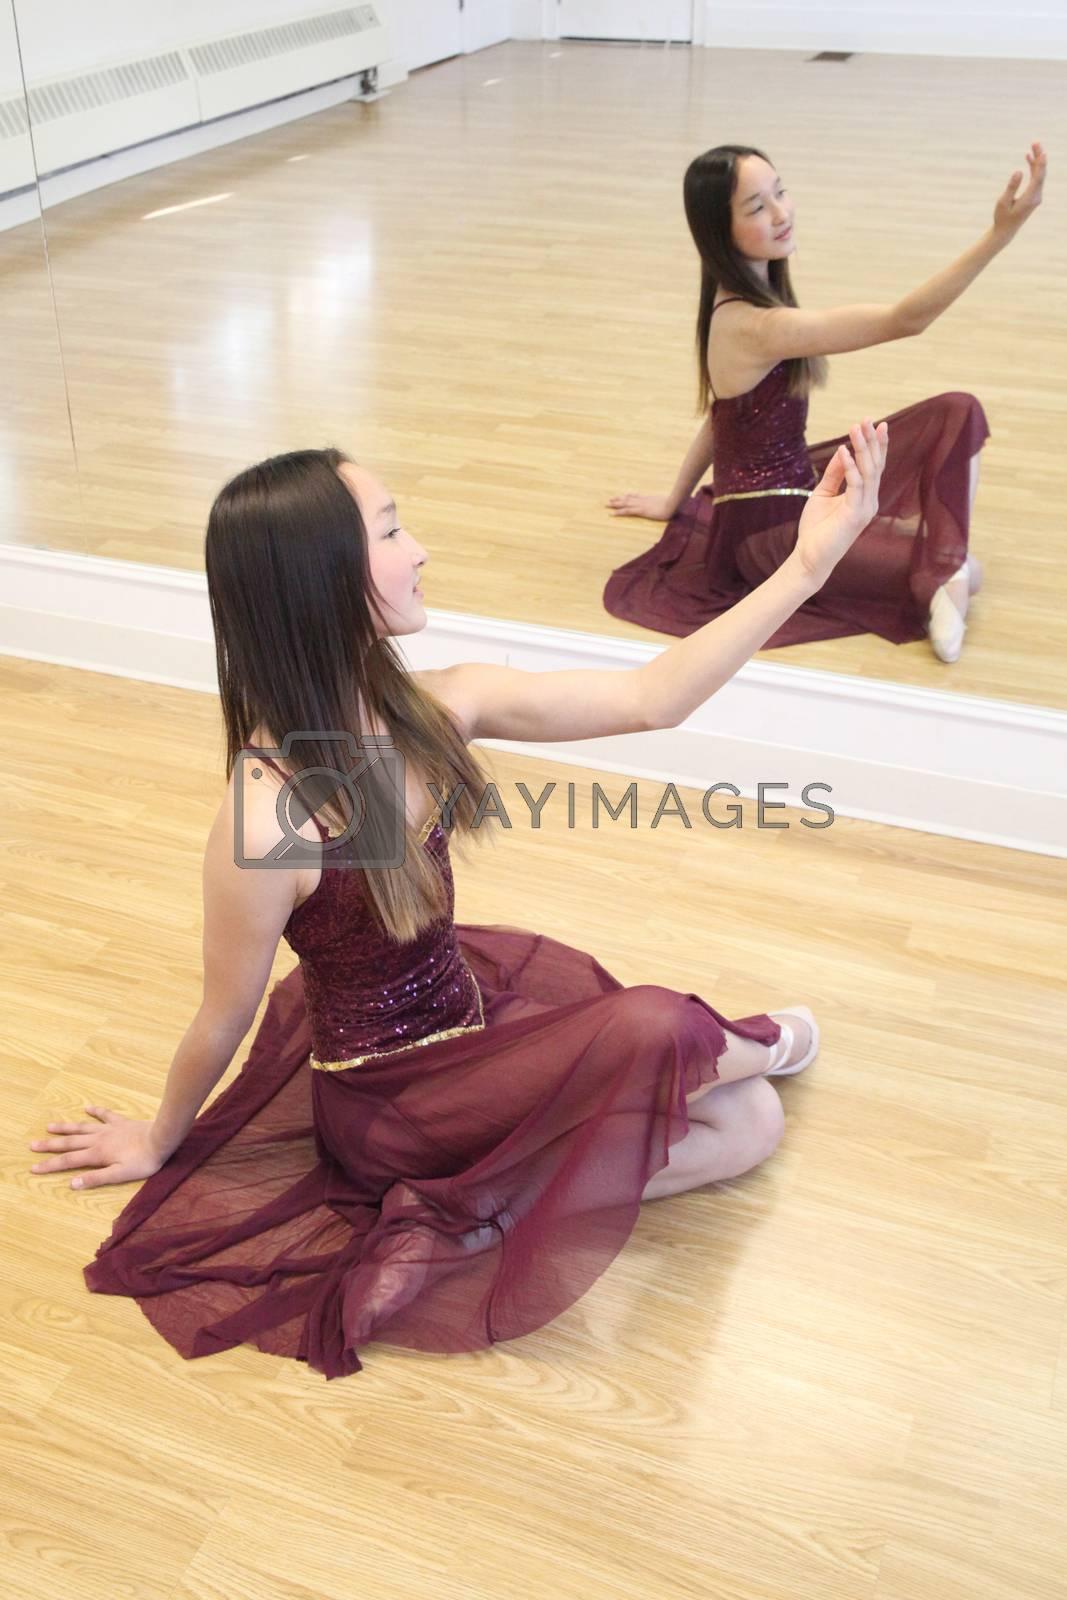 Beautiful brunette teen dancer in a burgundy costume